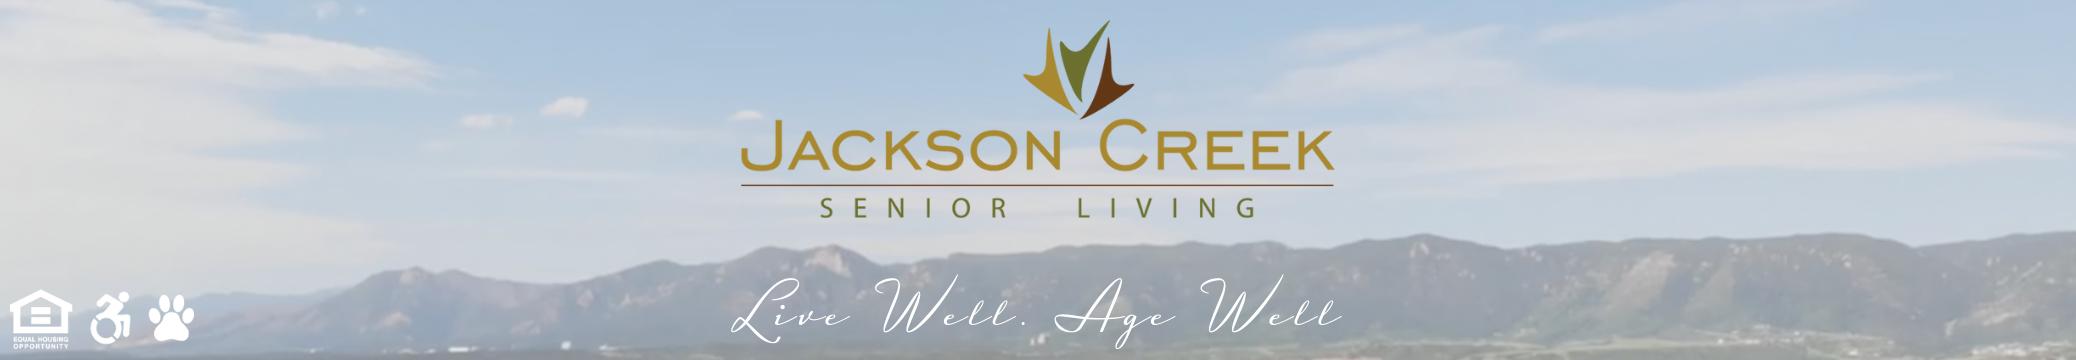 Jackson Creek Senior Living - Website Header